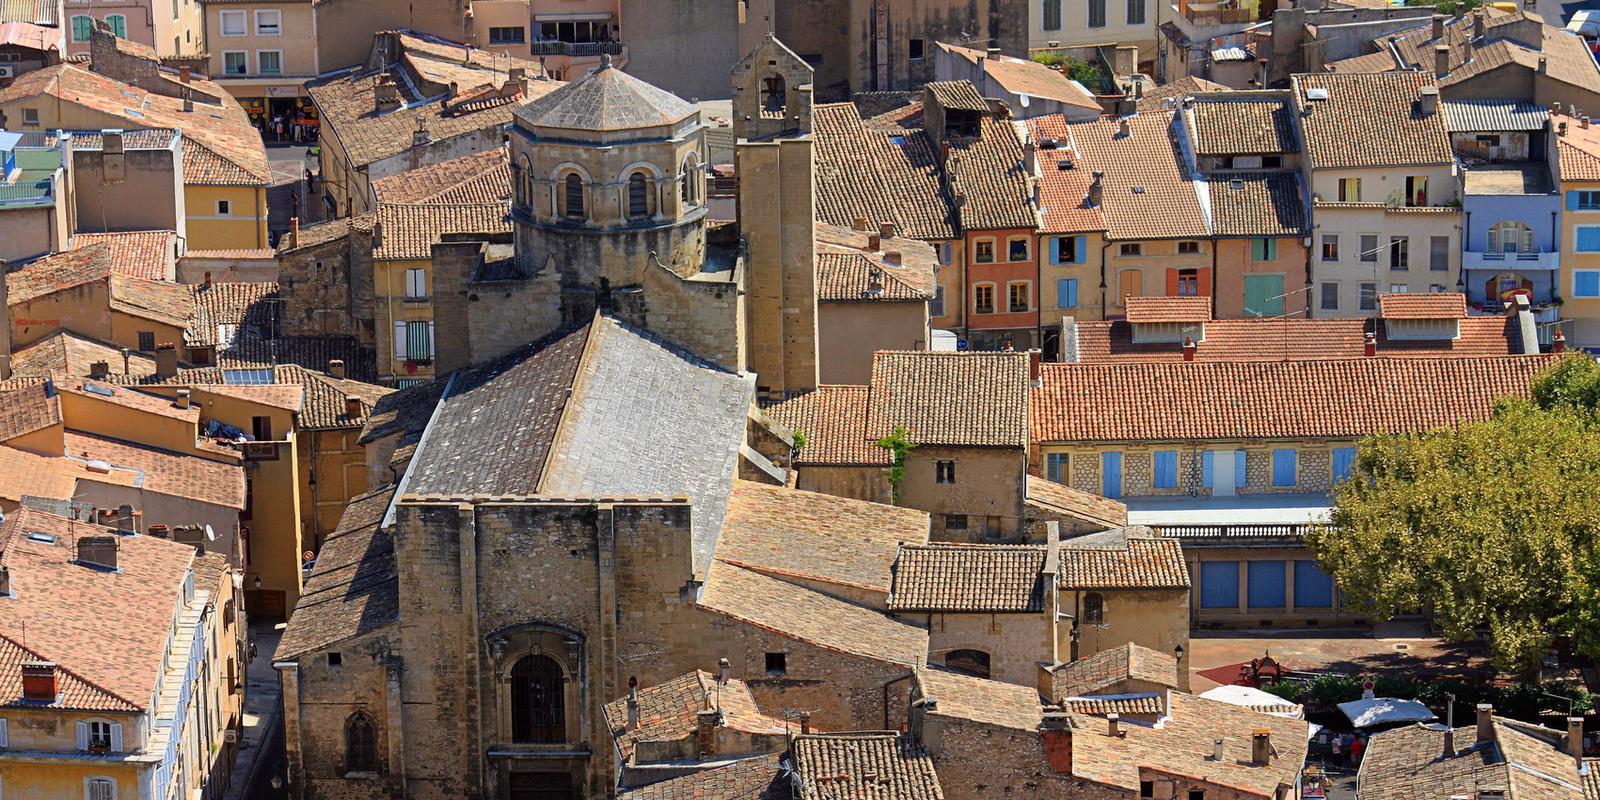 Les toits de Cavaillon